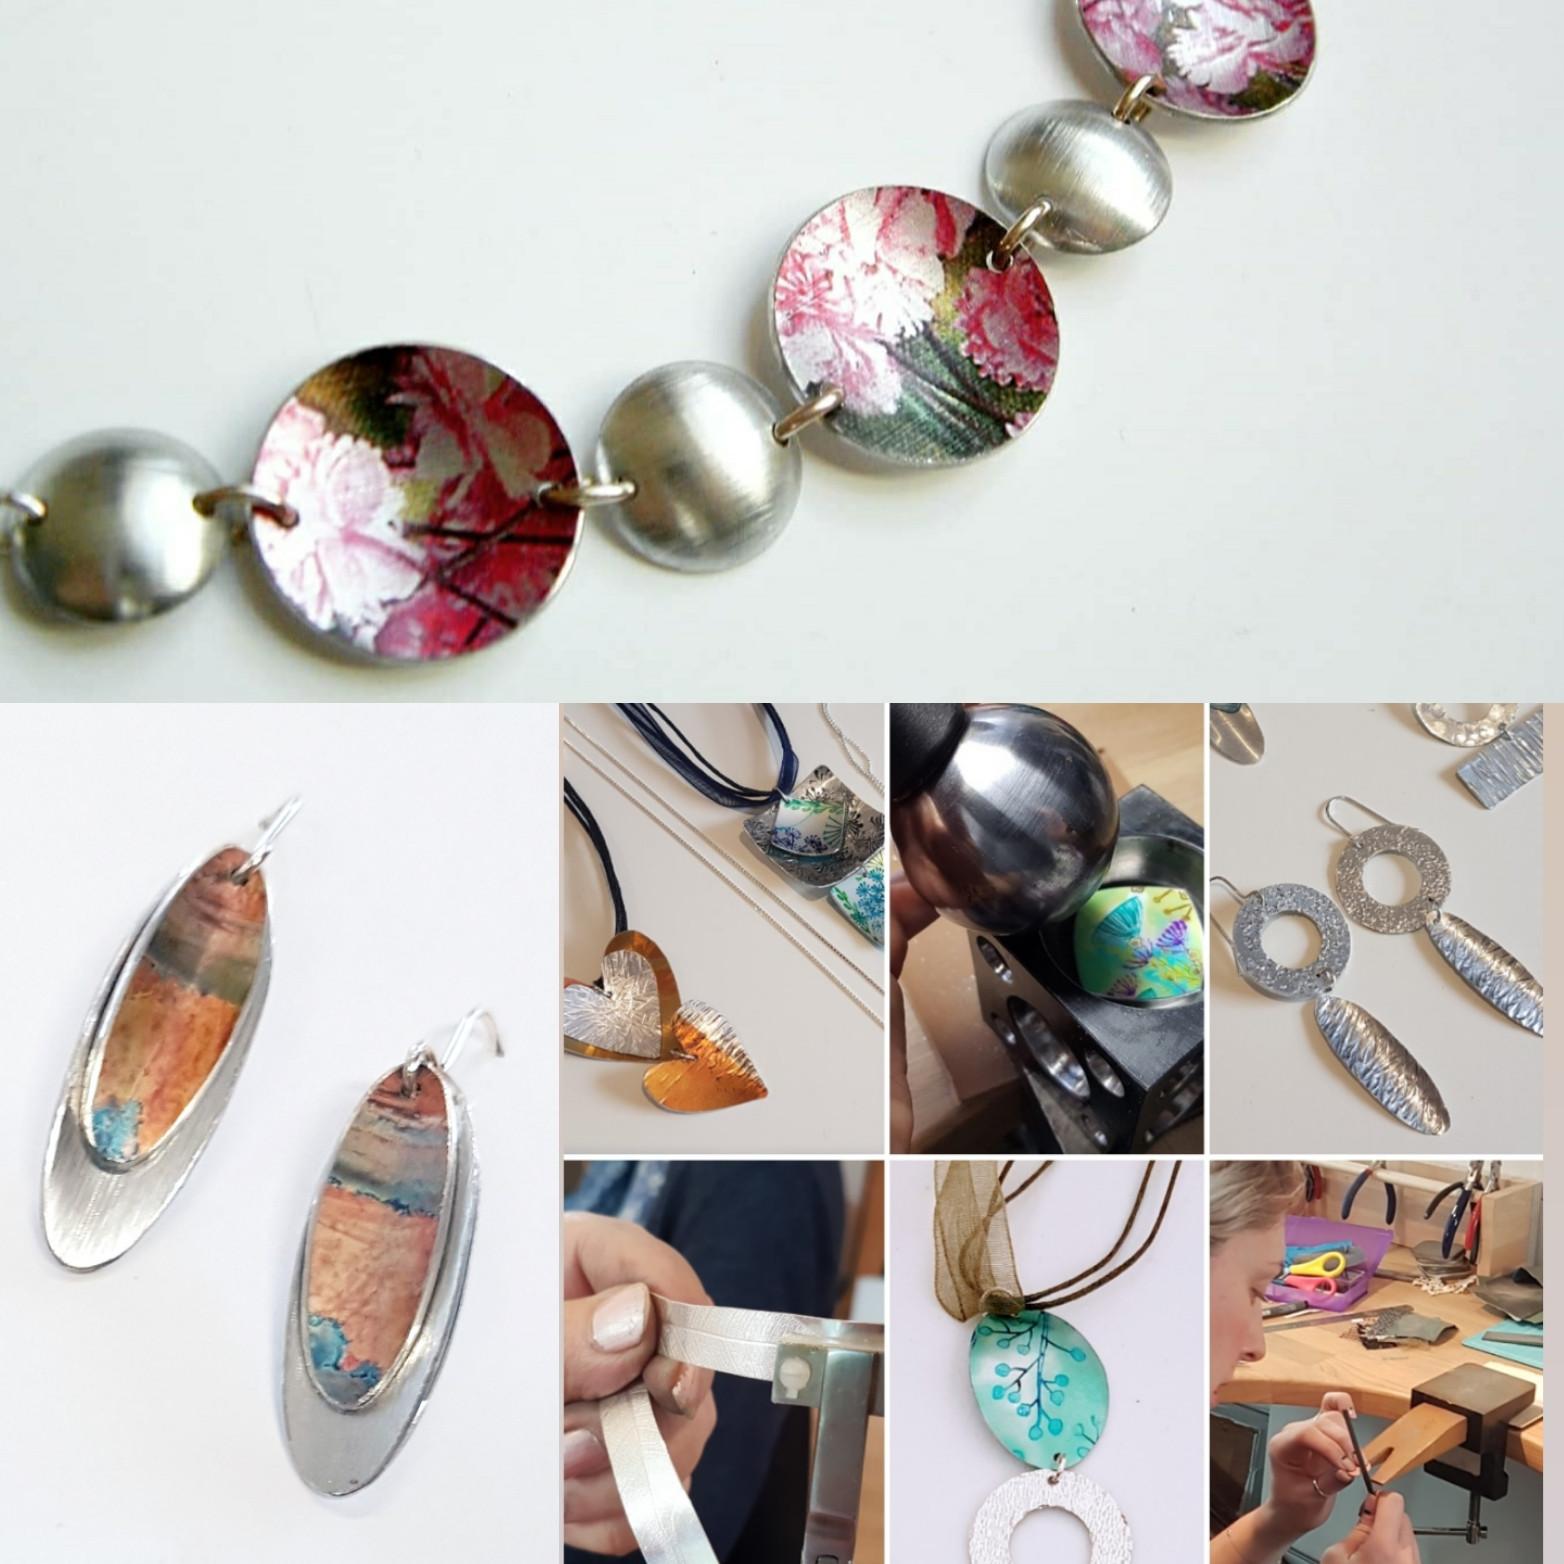 Saturday Jewellery, Earrings or Bracelet